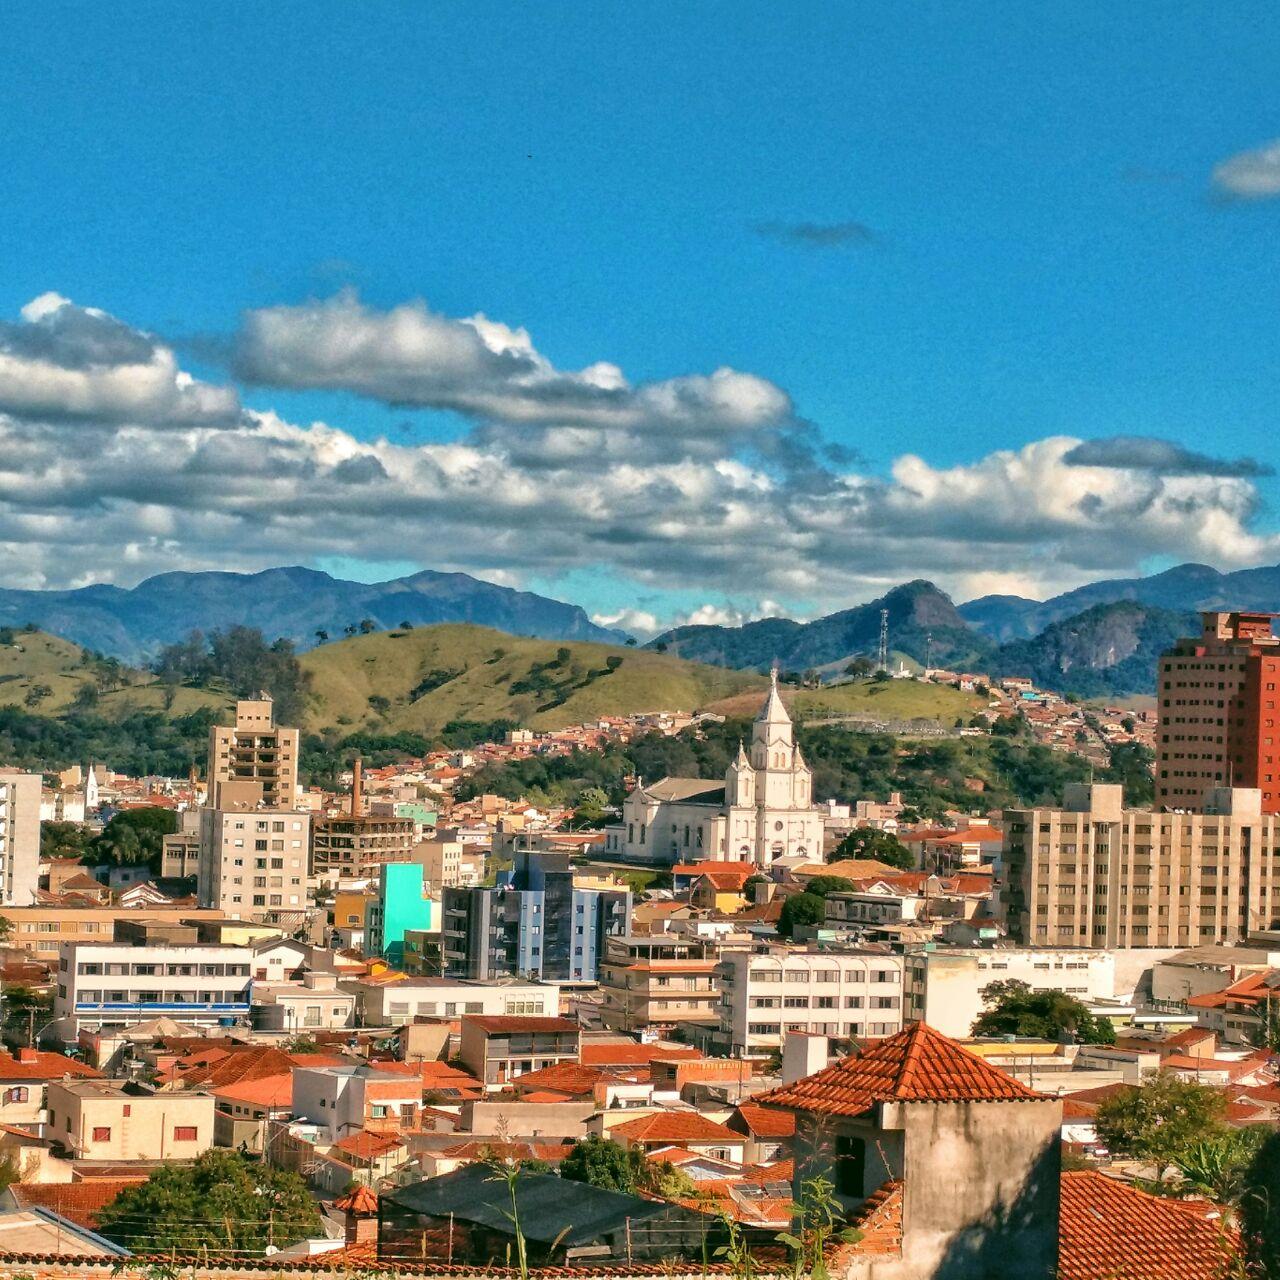 Itajubá Minas Gerais fonte: upload.wikimedia.org